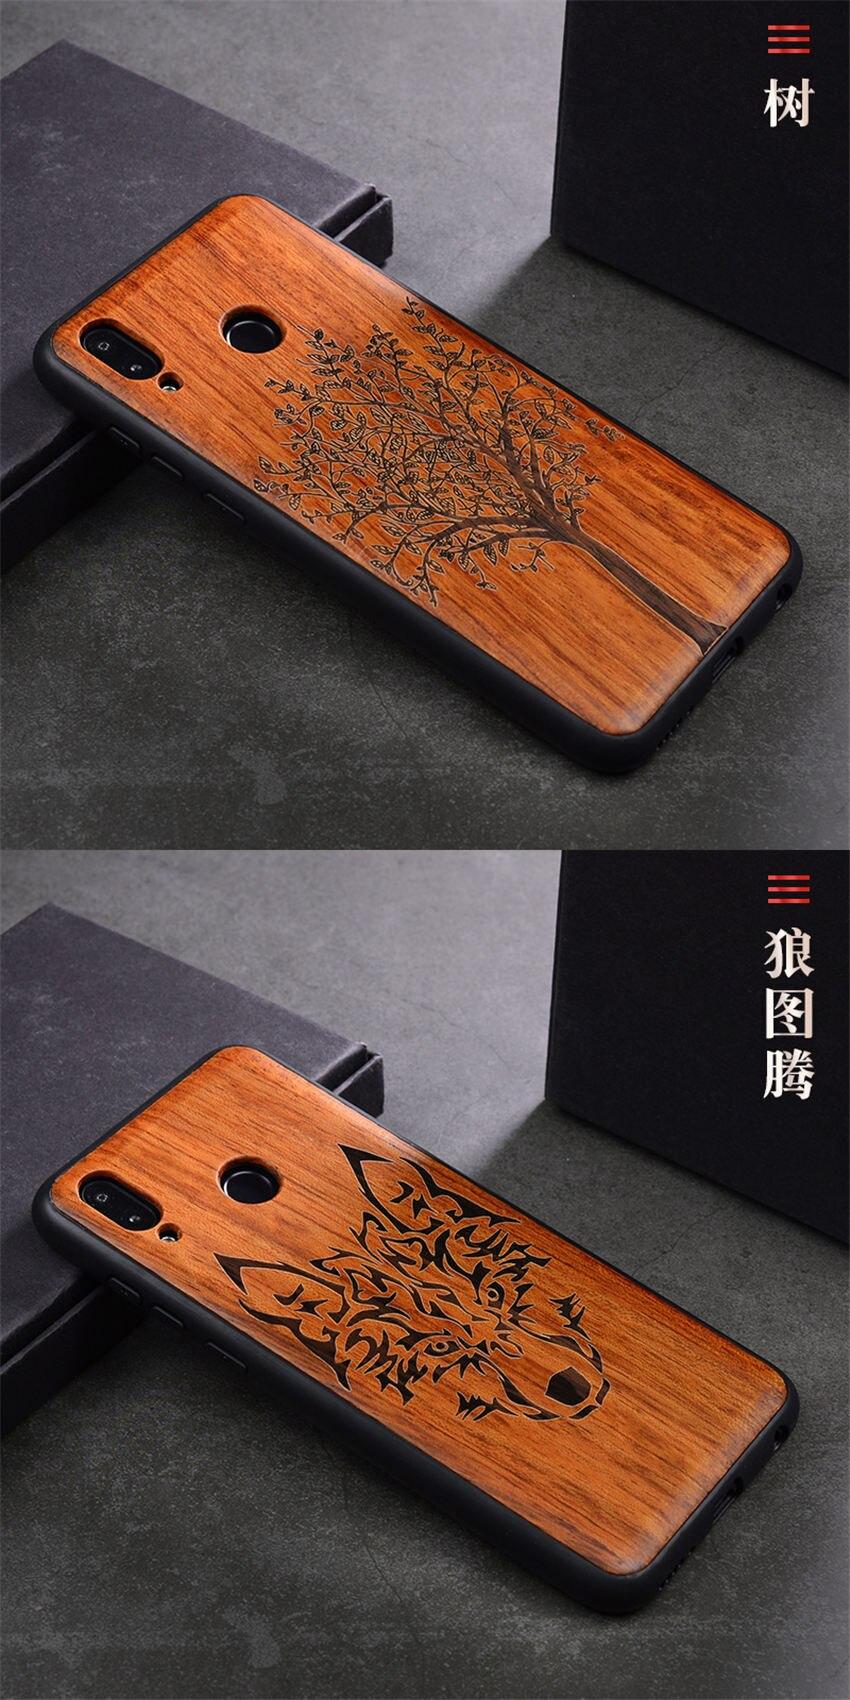 2018 New Huawei Honor 8x Case Slim Wood Back Cover TPU Bumper Case For Huawei Honor 8x Phone Cases Honor-8x (12)